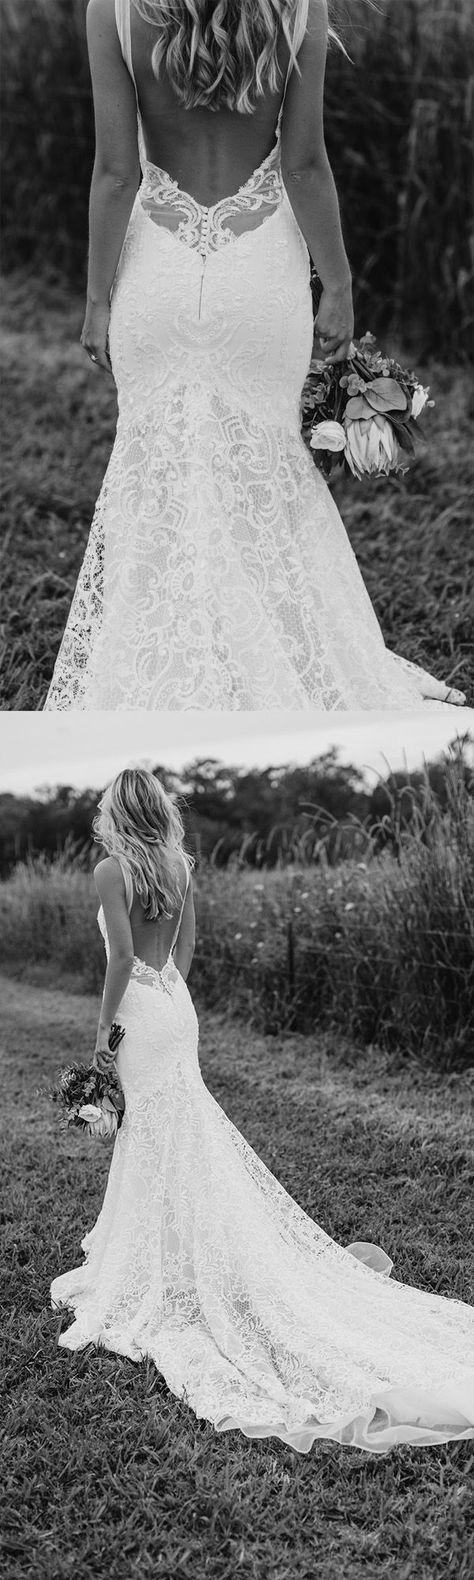 Sexy low back wedding gown (scheduled via http://www.tailwindapp.com?utm_source=pinterest&utm_medium=twpin)